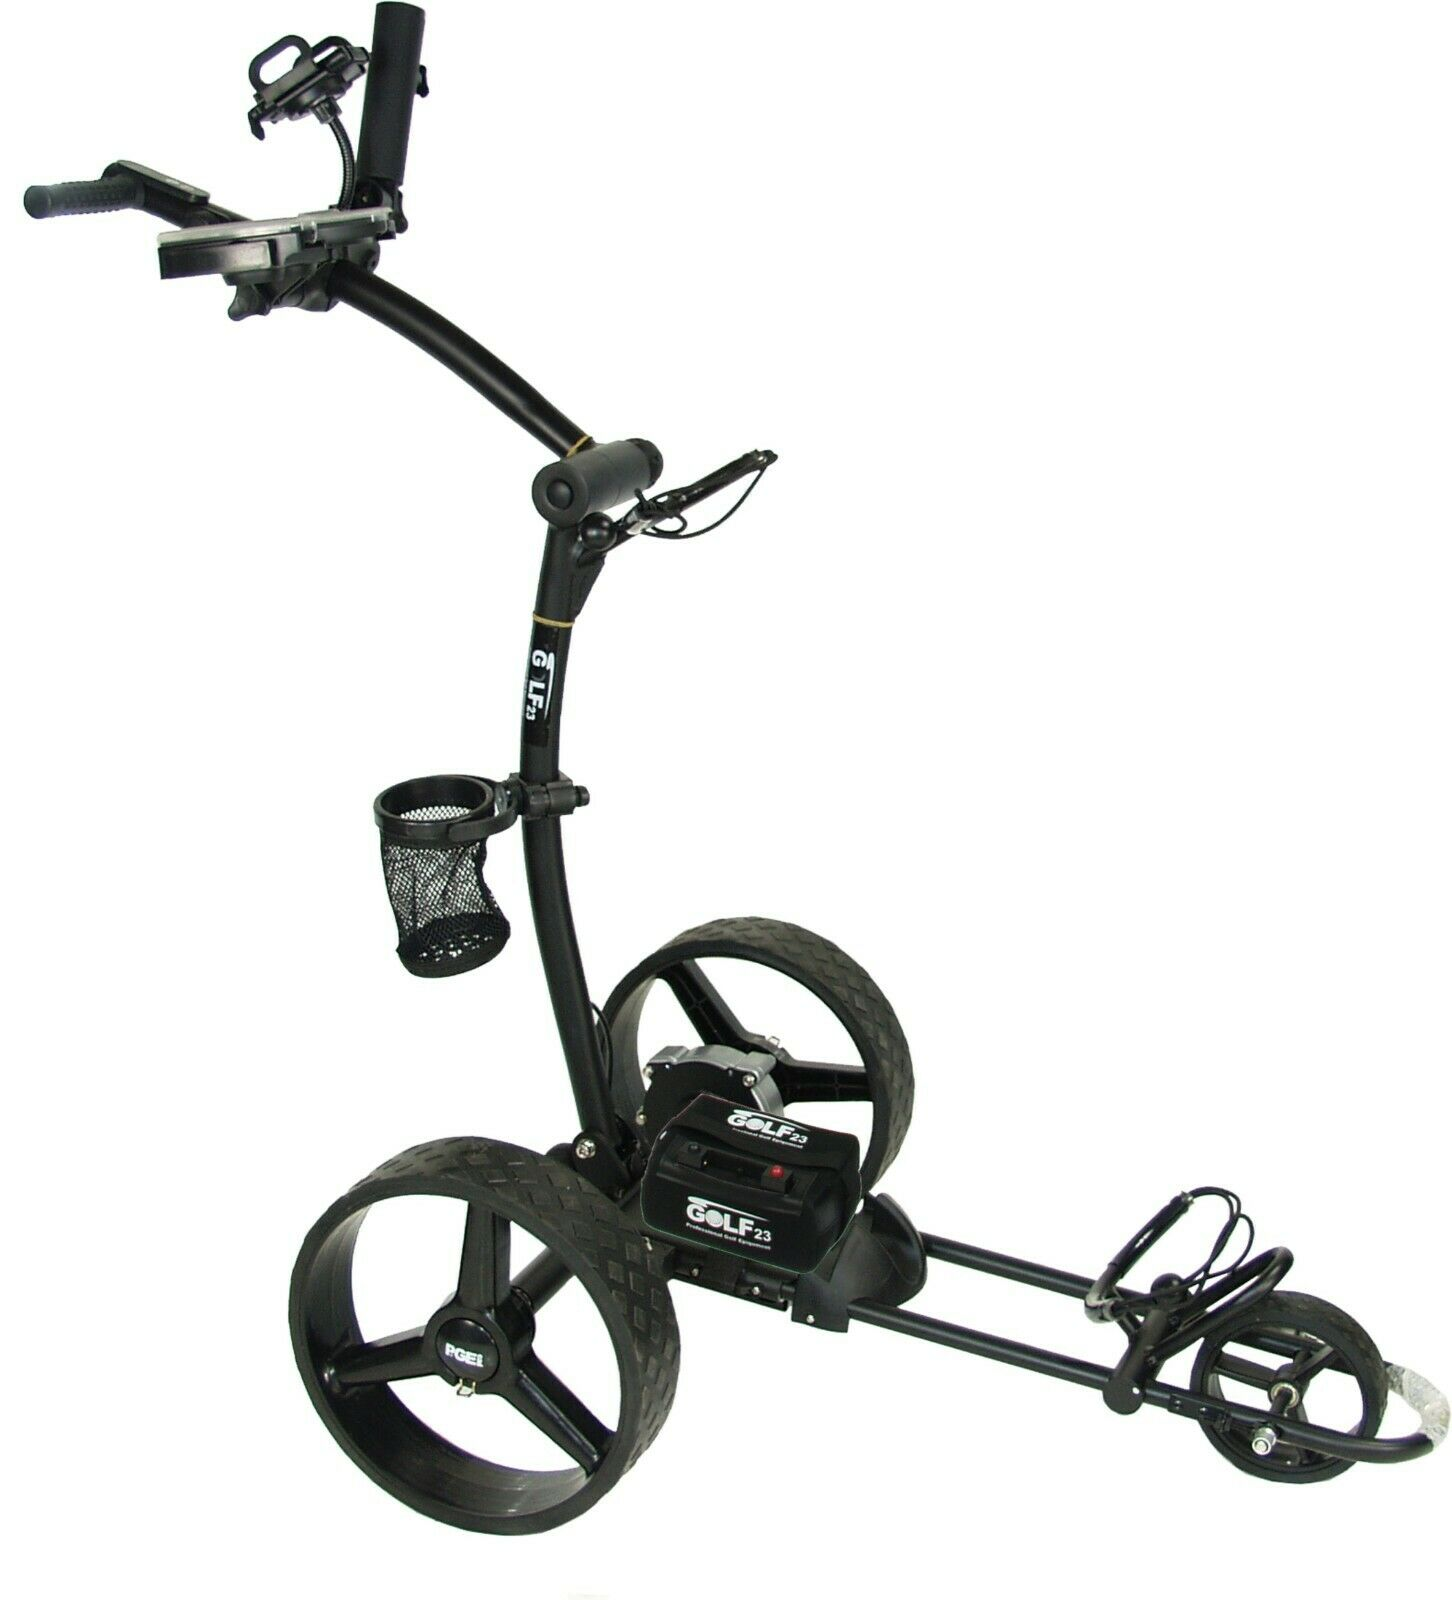 GOLF23 Elektro Golf Trolley 3.1 LithiumAkku 20Ah,USB,Vollausstattung, schwarz